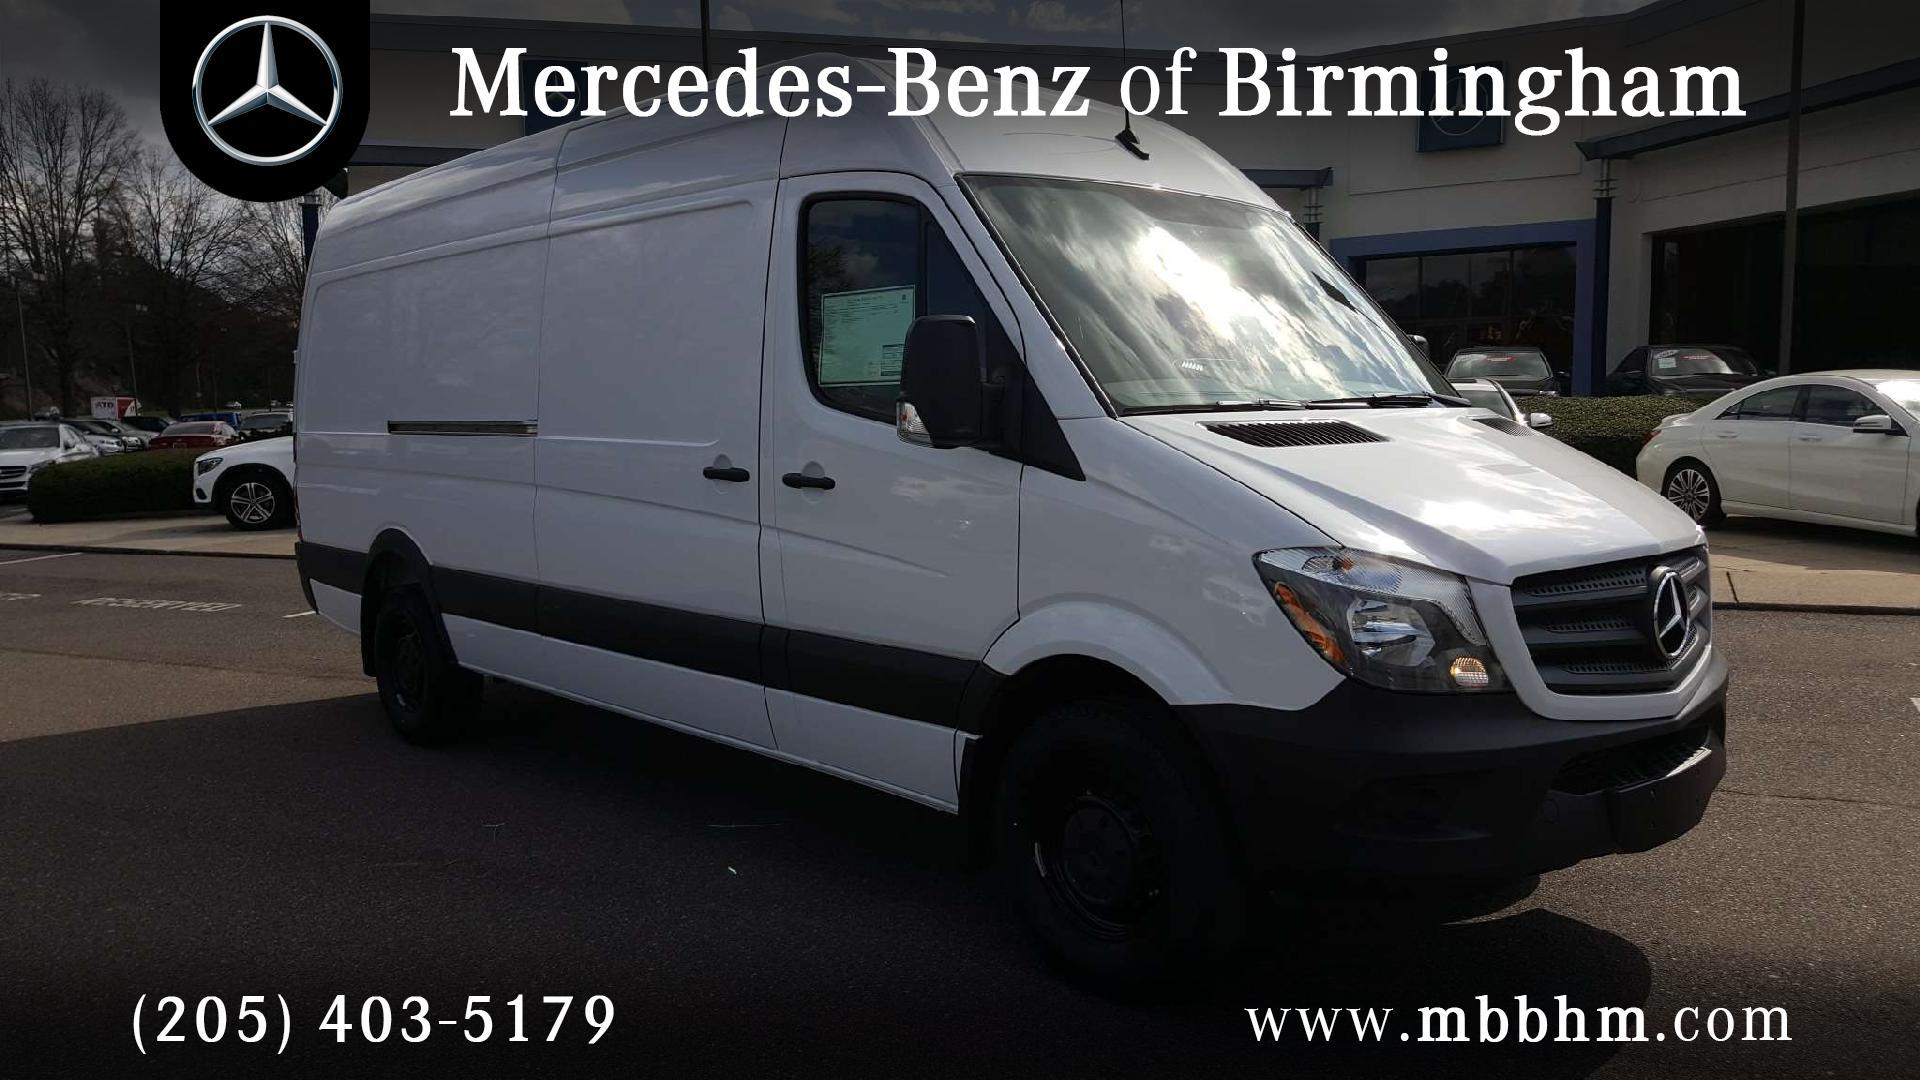 New Commercial Trucks For Sale MercedesBenz Of Birmingham - Mercedes benz commercial vans